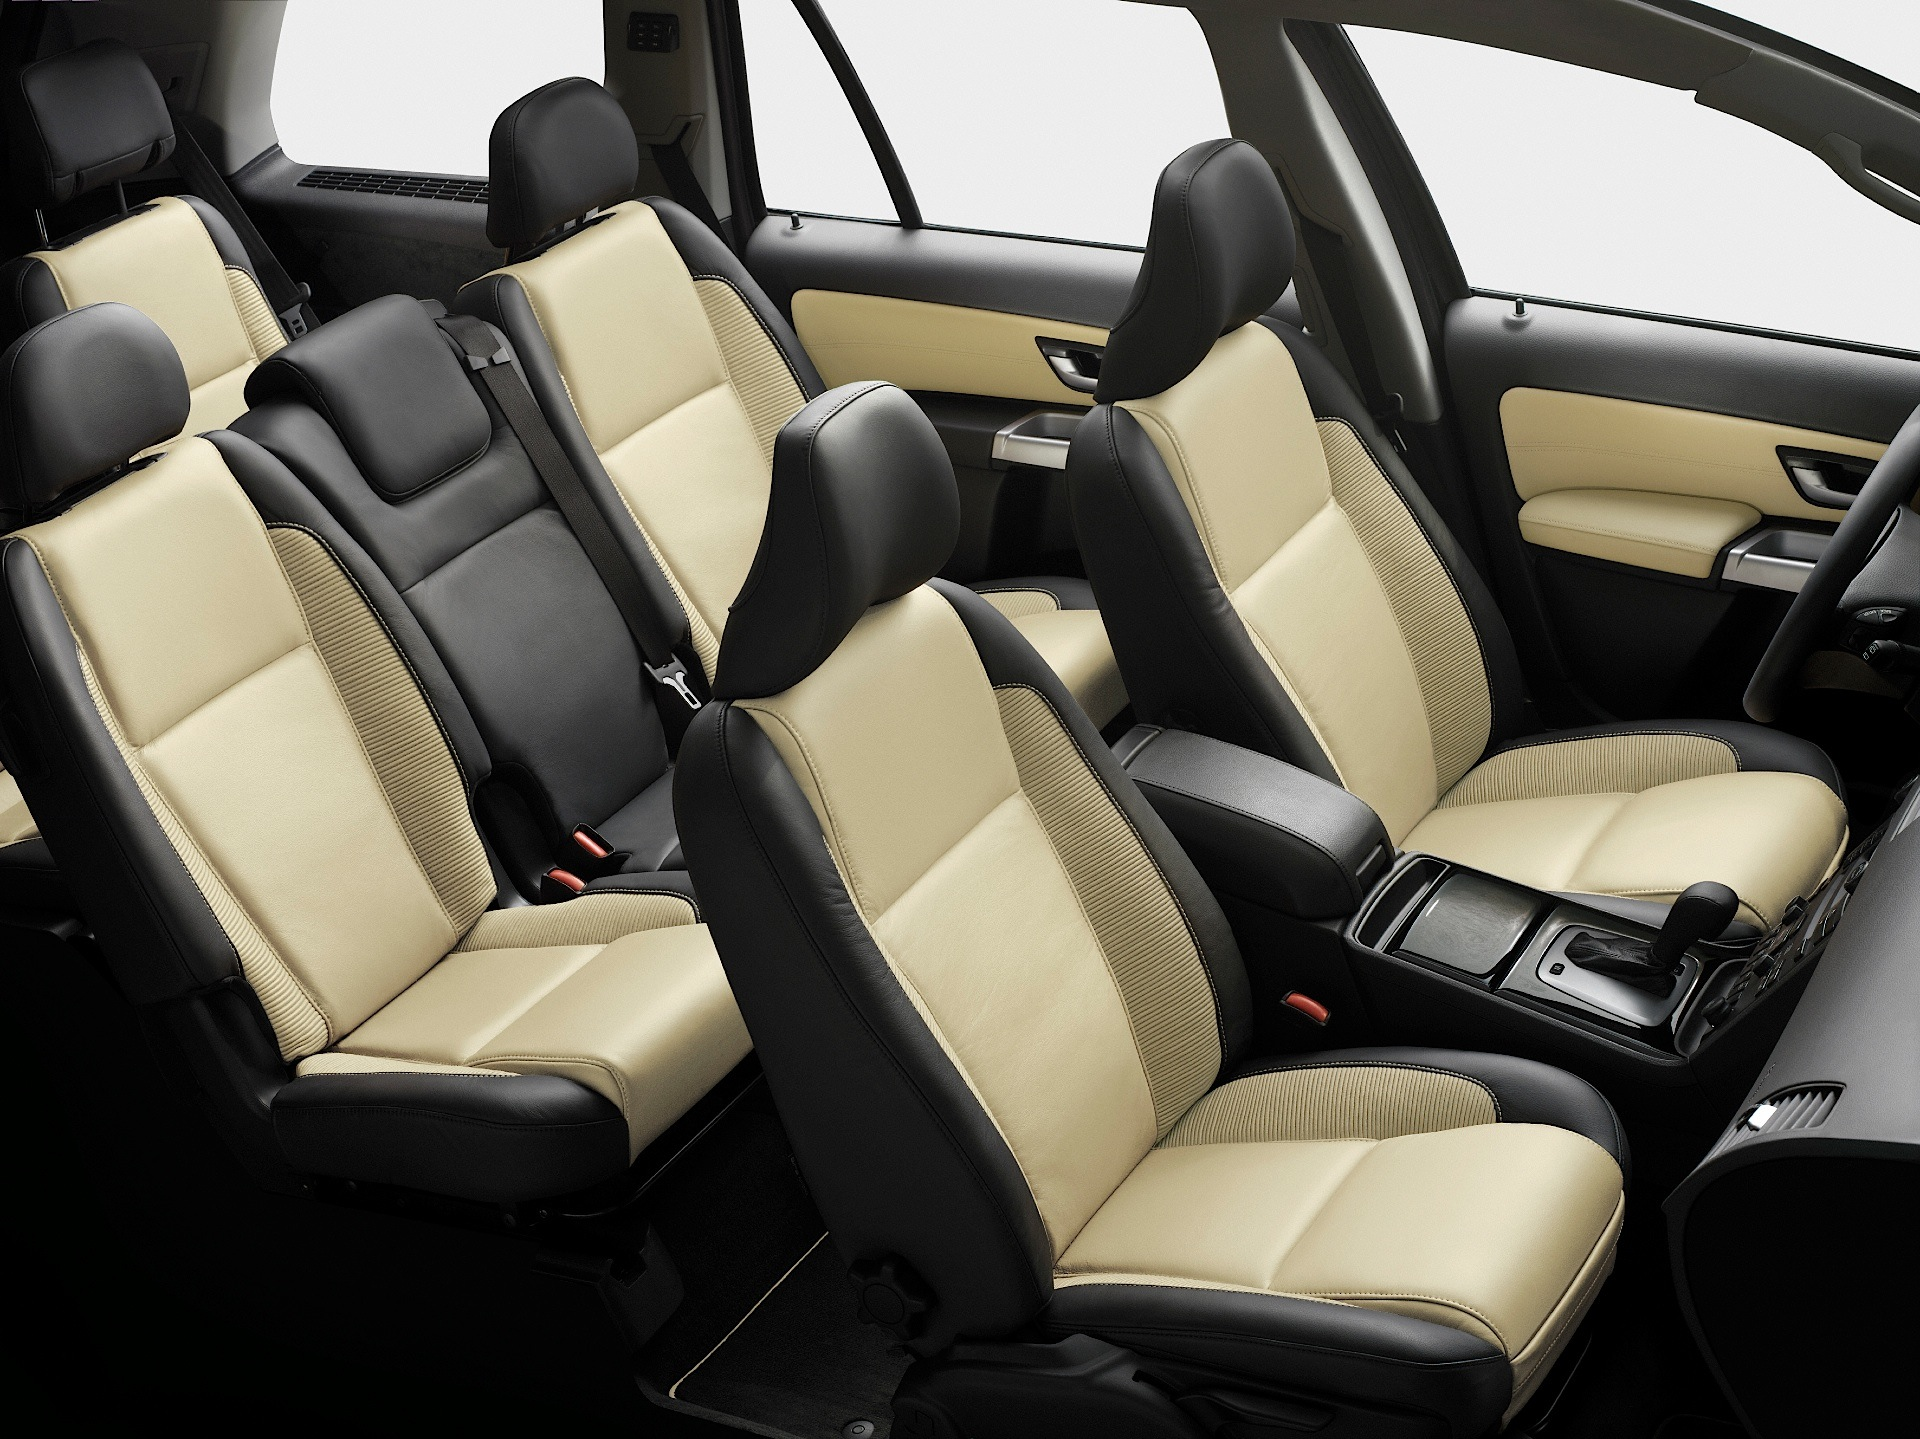 2003 volvo xc90 interior. volvo xc90 2002 2006 2003 volvo xc90 interior p